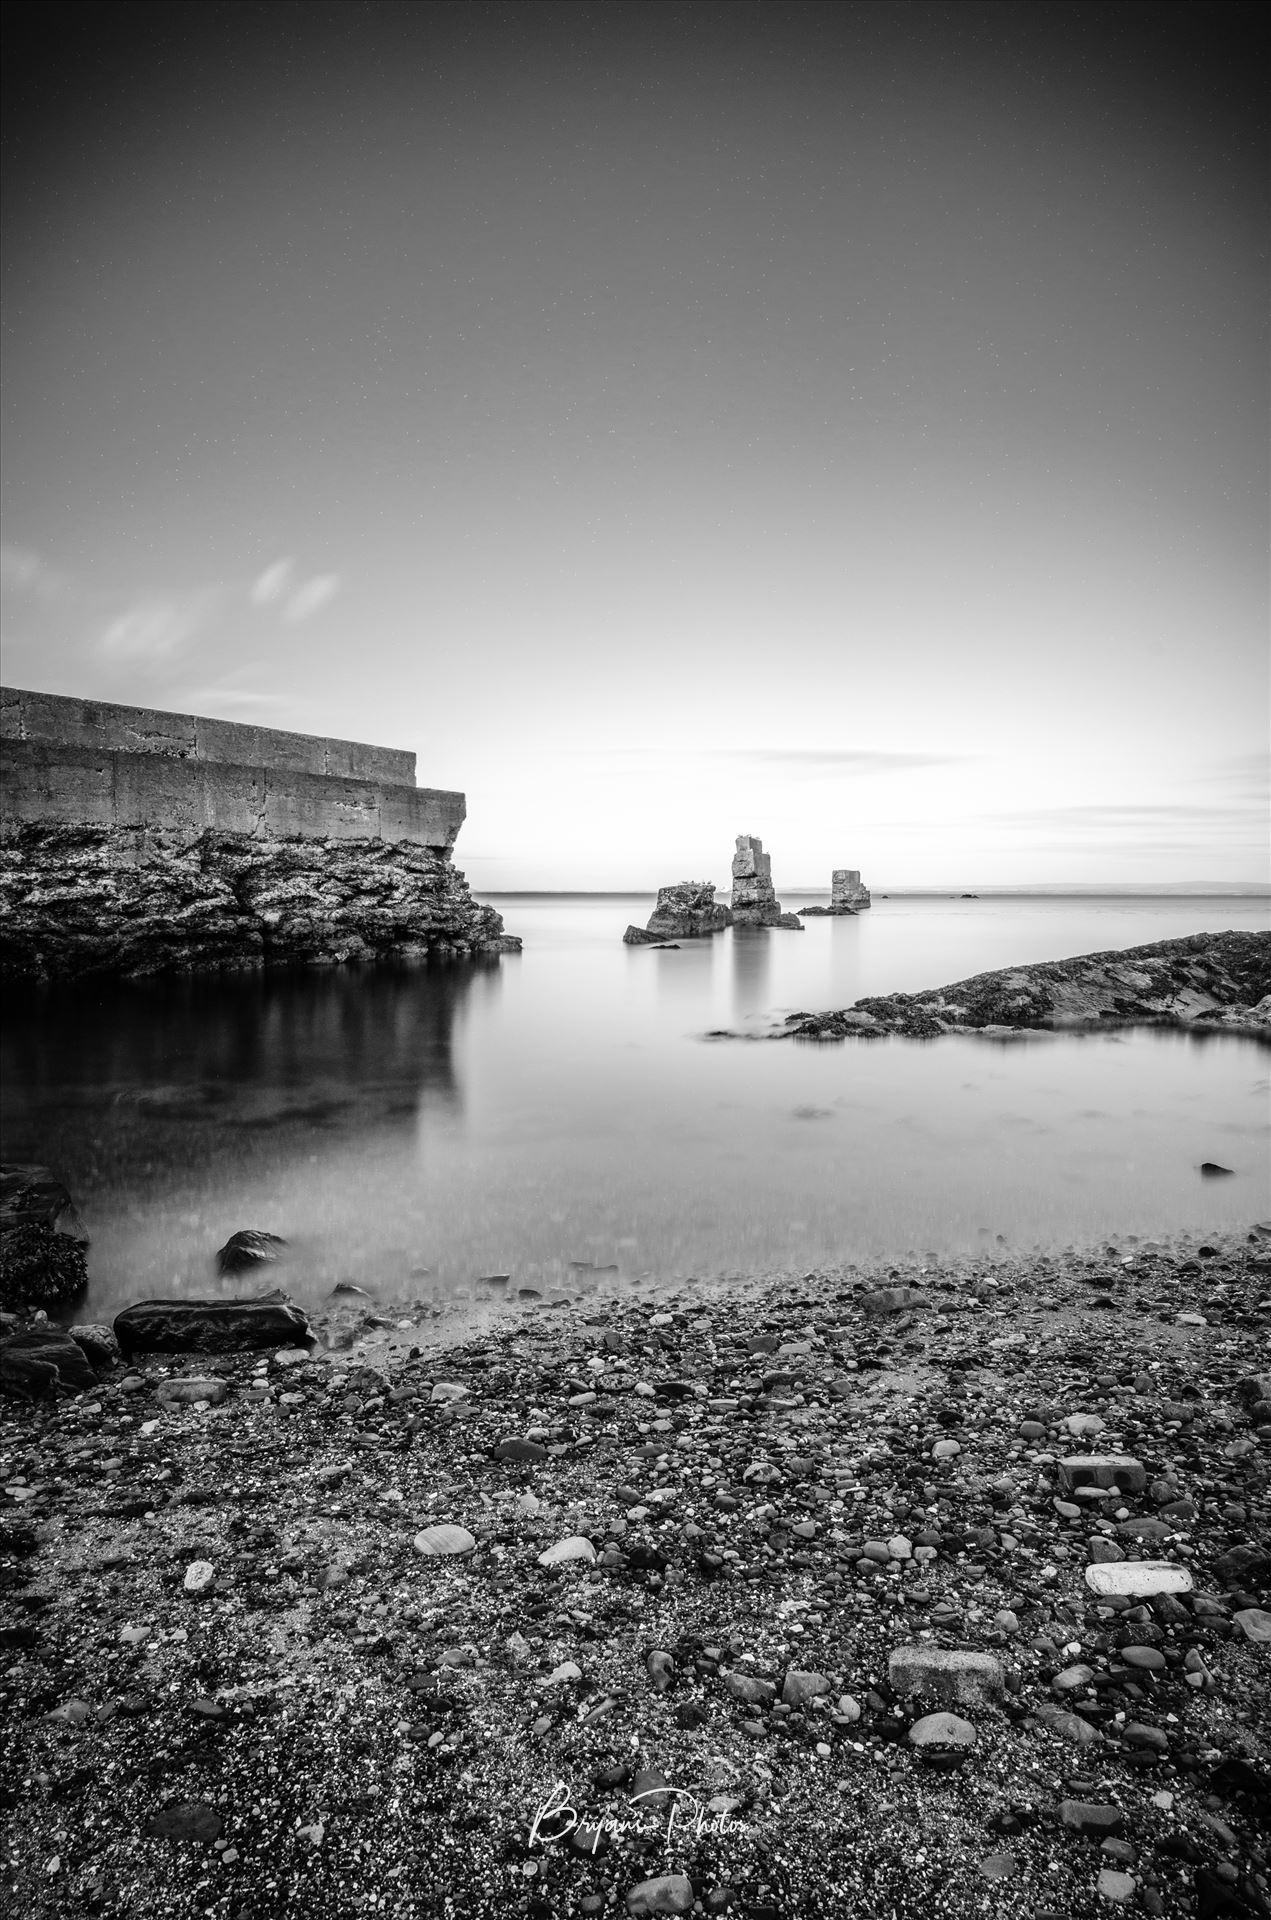 Seafield A long exposure photograph taken at Seafield beach Kirkcaldy. by Bryans Photos